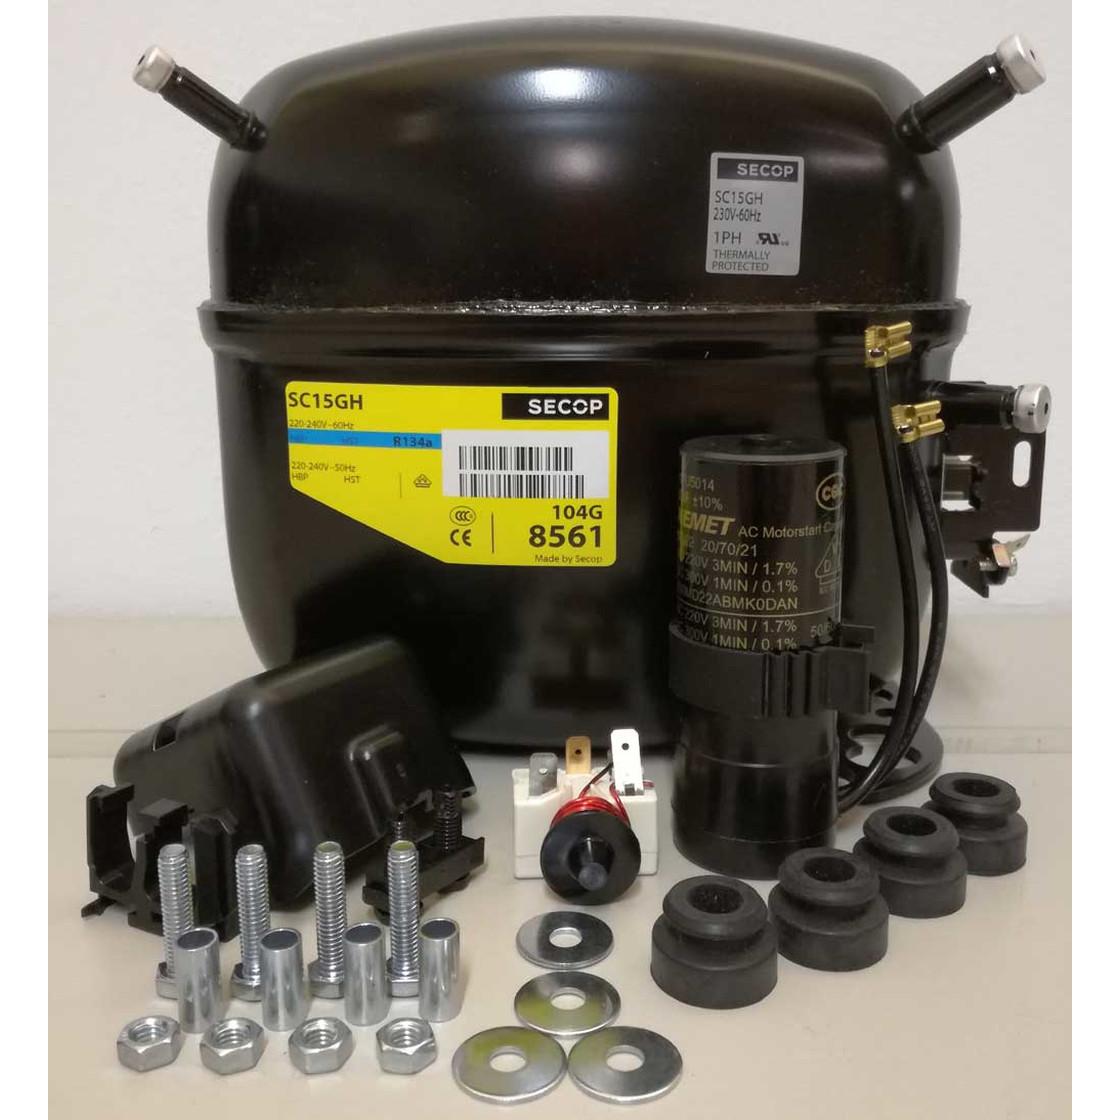 Danfoss Sc15g Compressor Wiring Diagram  Embraco Compressor Wiring